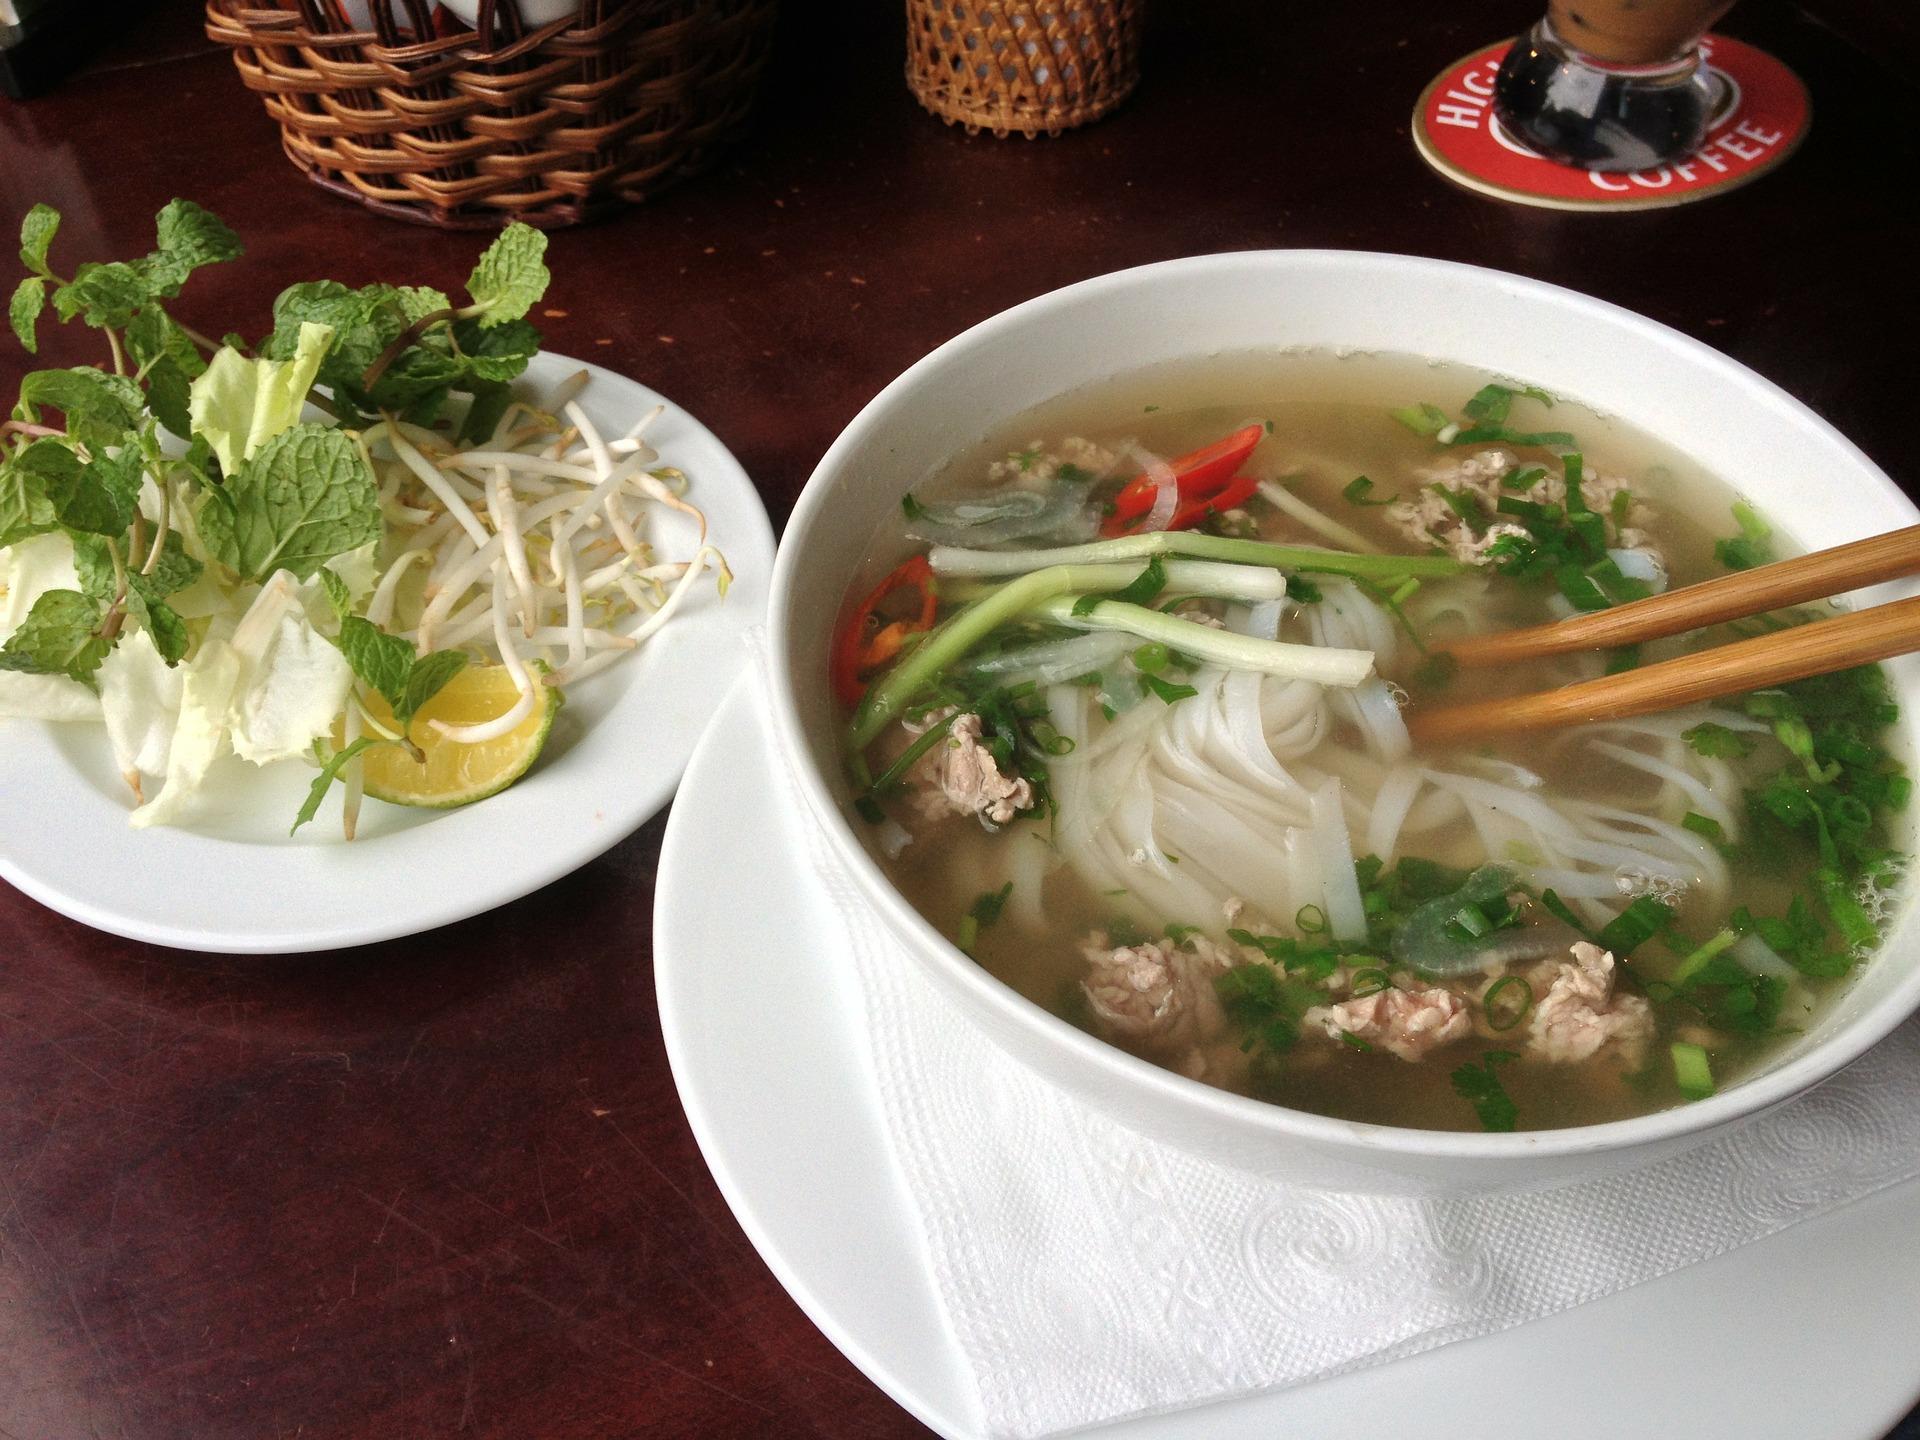 Ny Restaurant Med Vietnamesisk Mad Er åbnet På Banegårdsgade I Aarhus